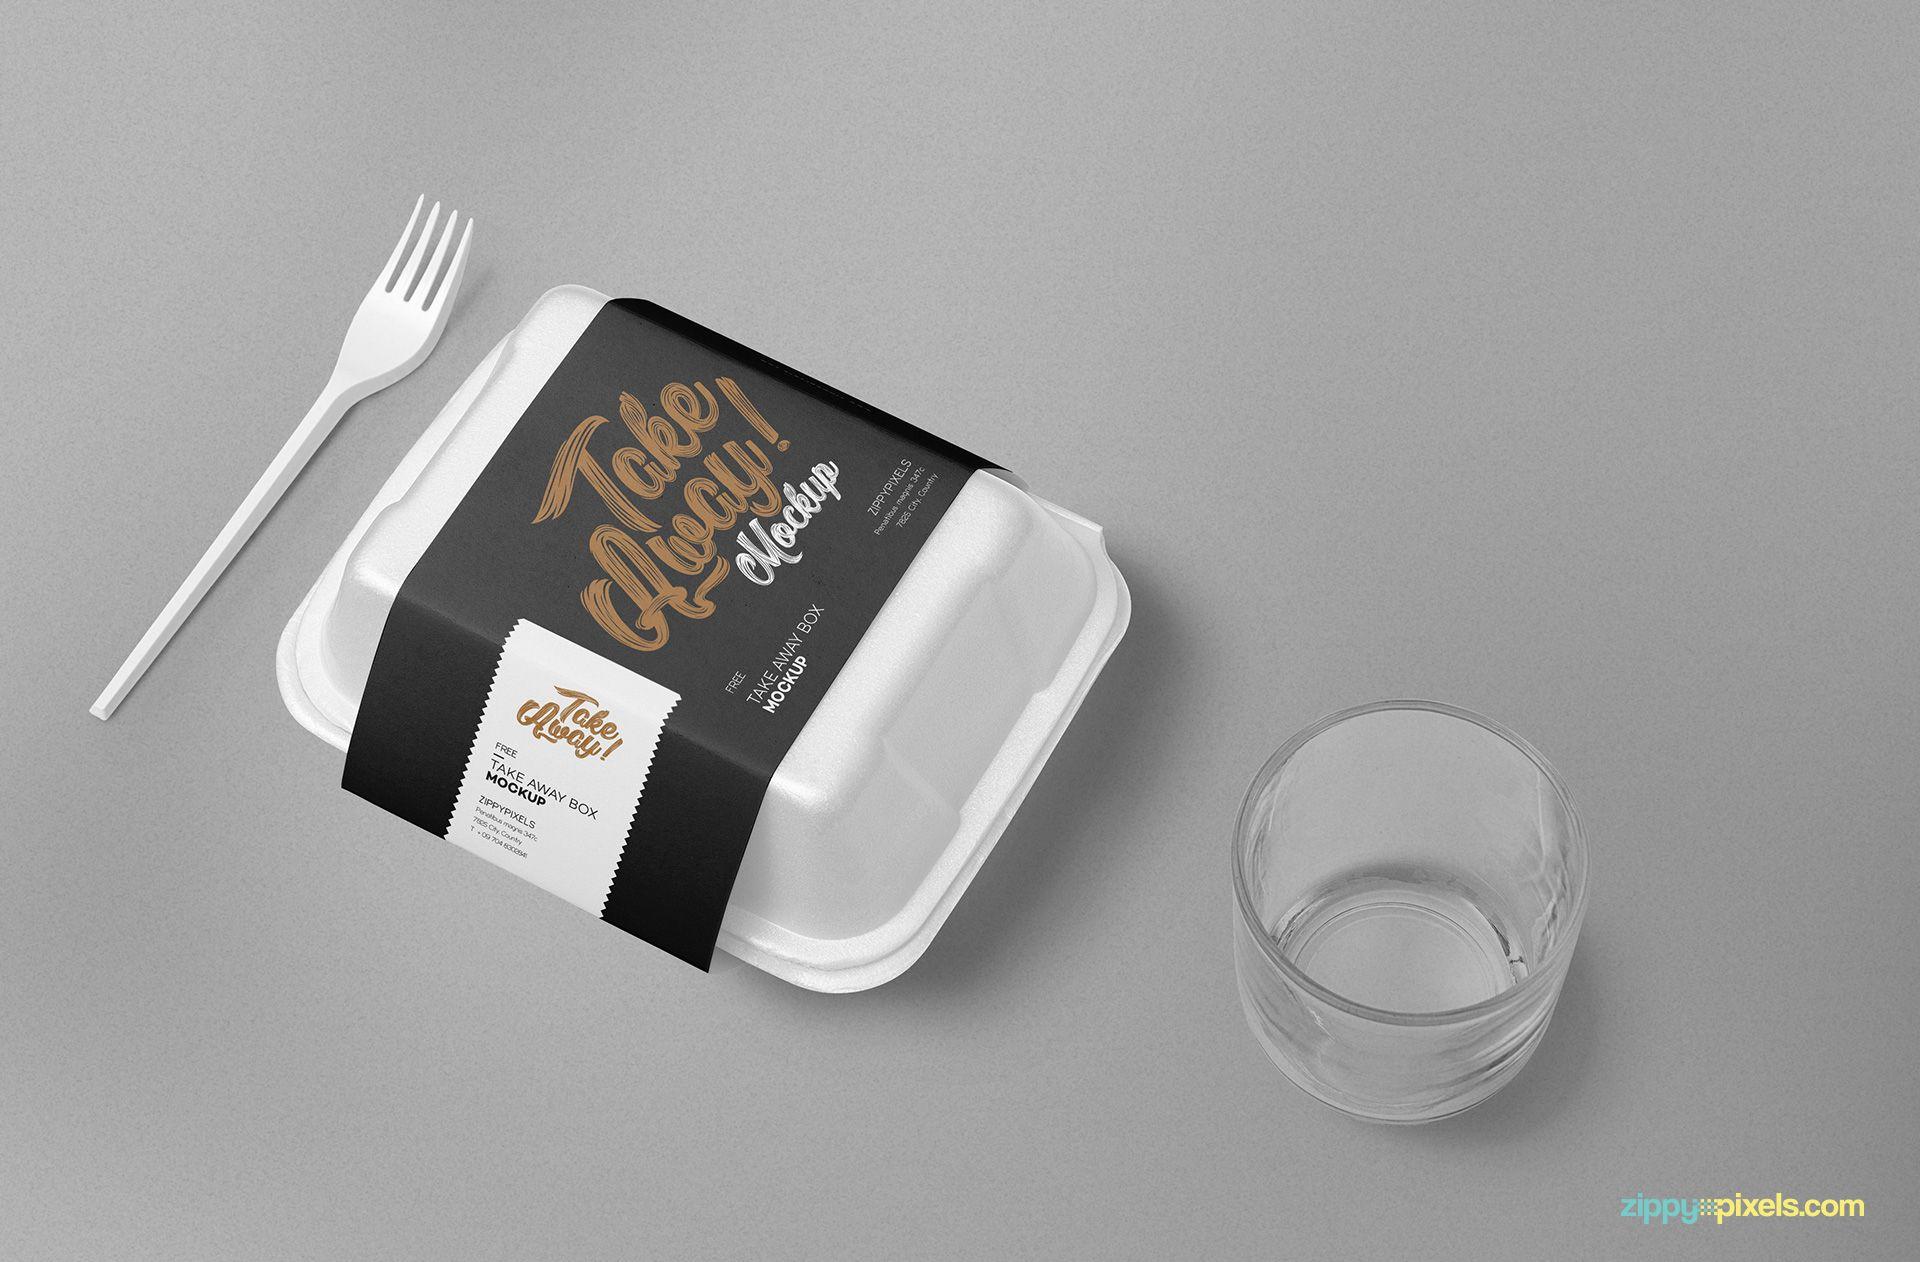 Download Free Disposable Food Packaging Mockup Zippypixels Food Packaging Packaging Design Packaging Mockup